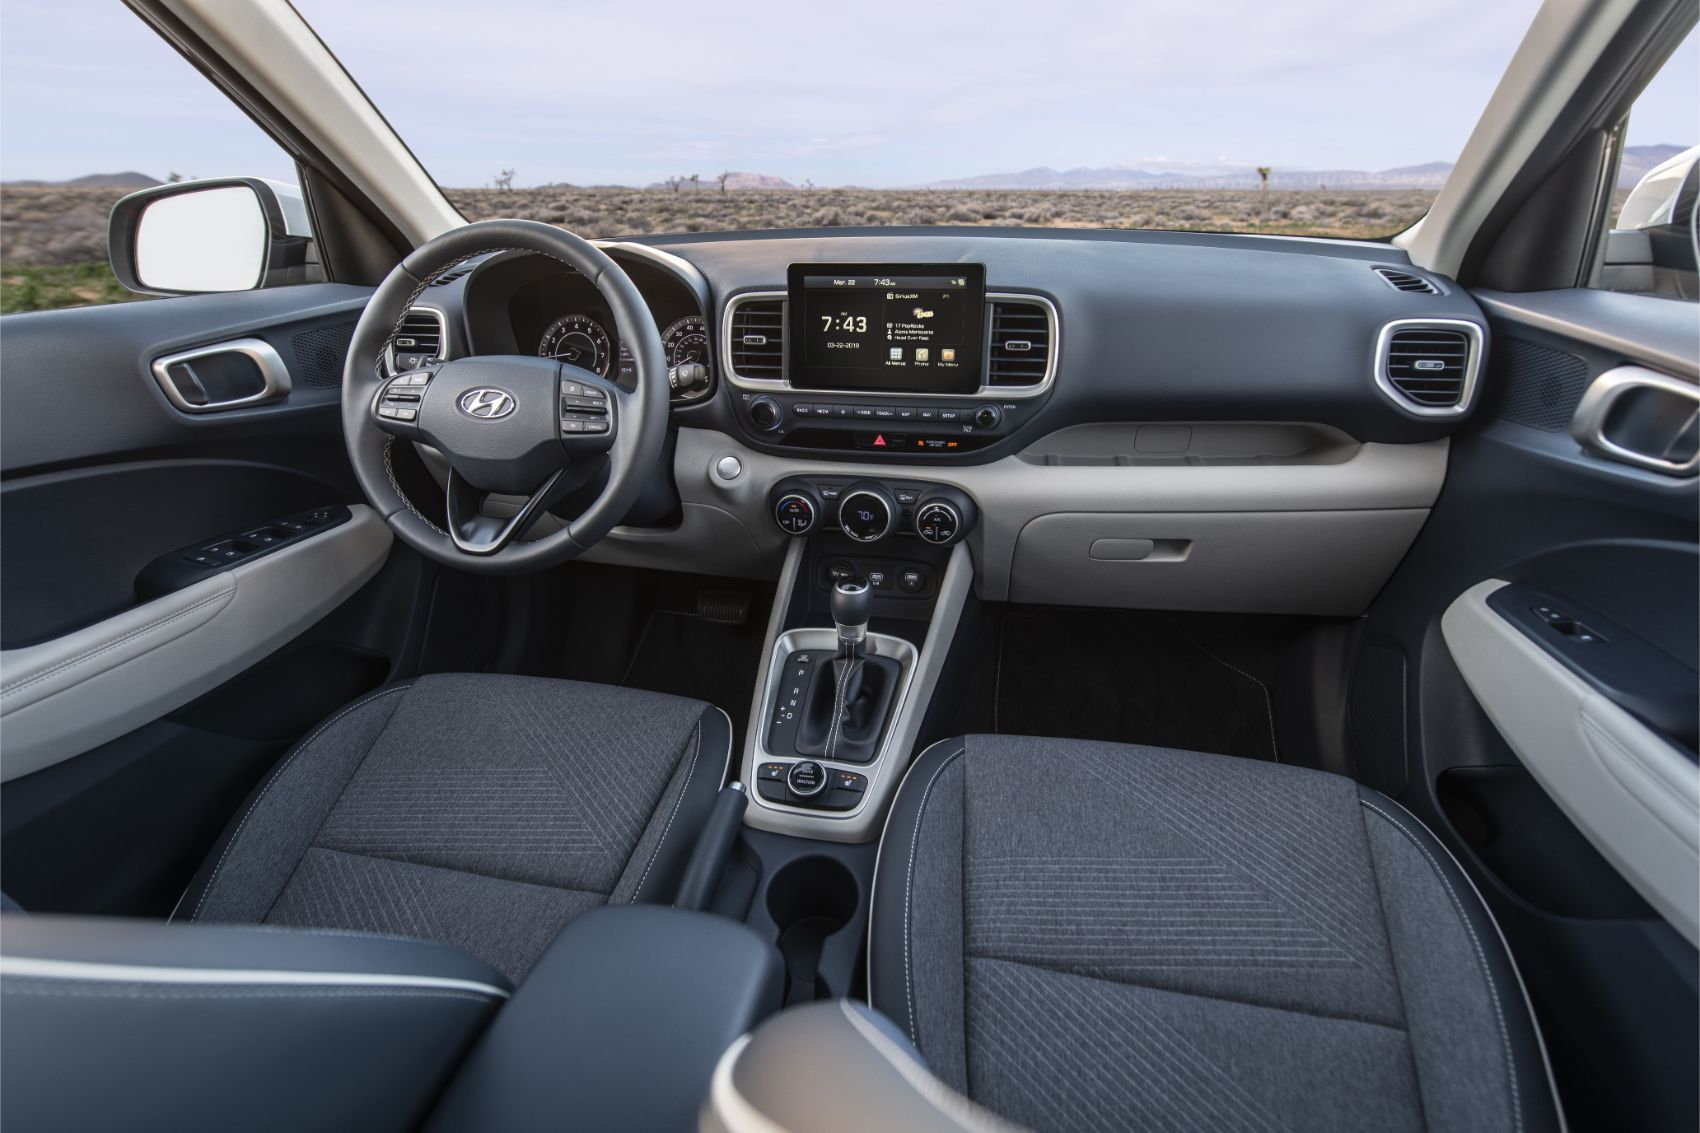 2020 Hyundai Venue Budget Friendly But Balanced